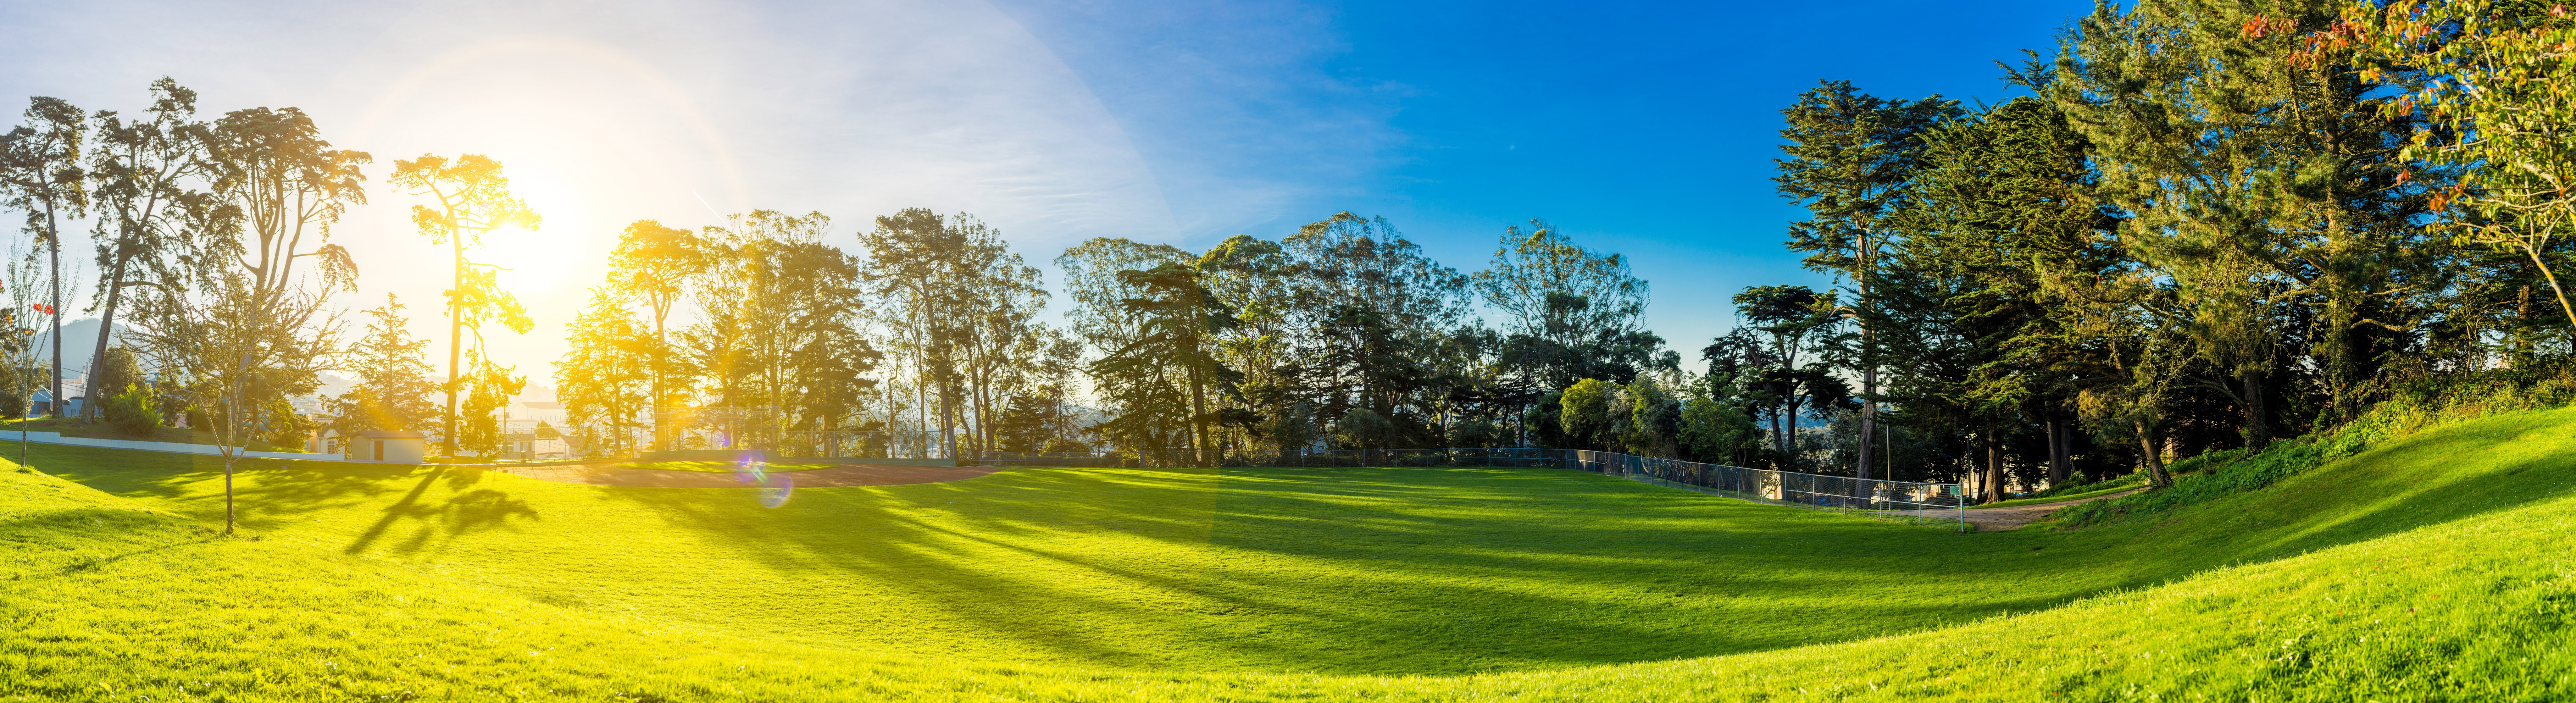 Hdの壁紙 ゴルフ ゴルフ場の無料の写真素材